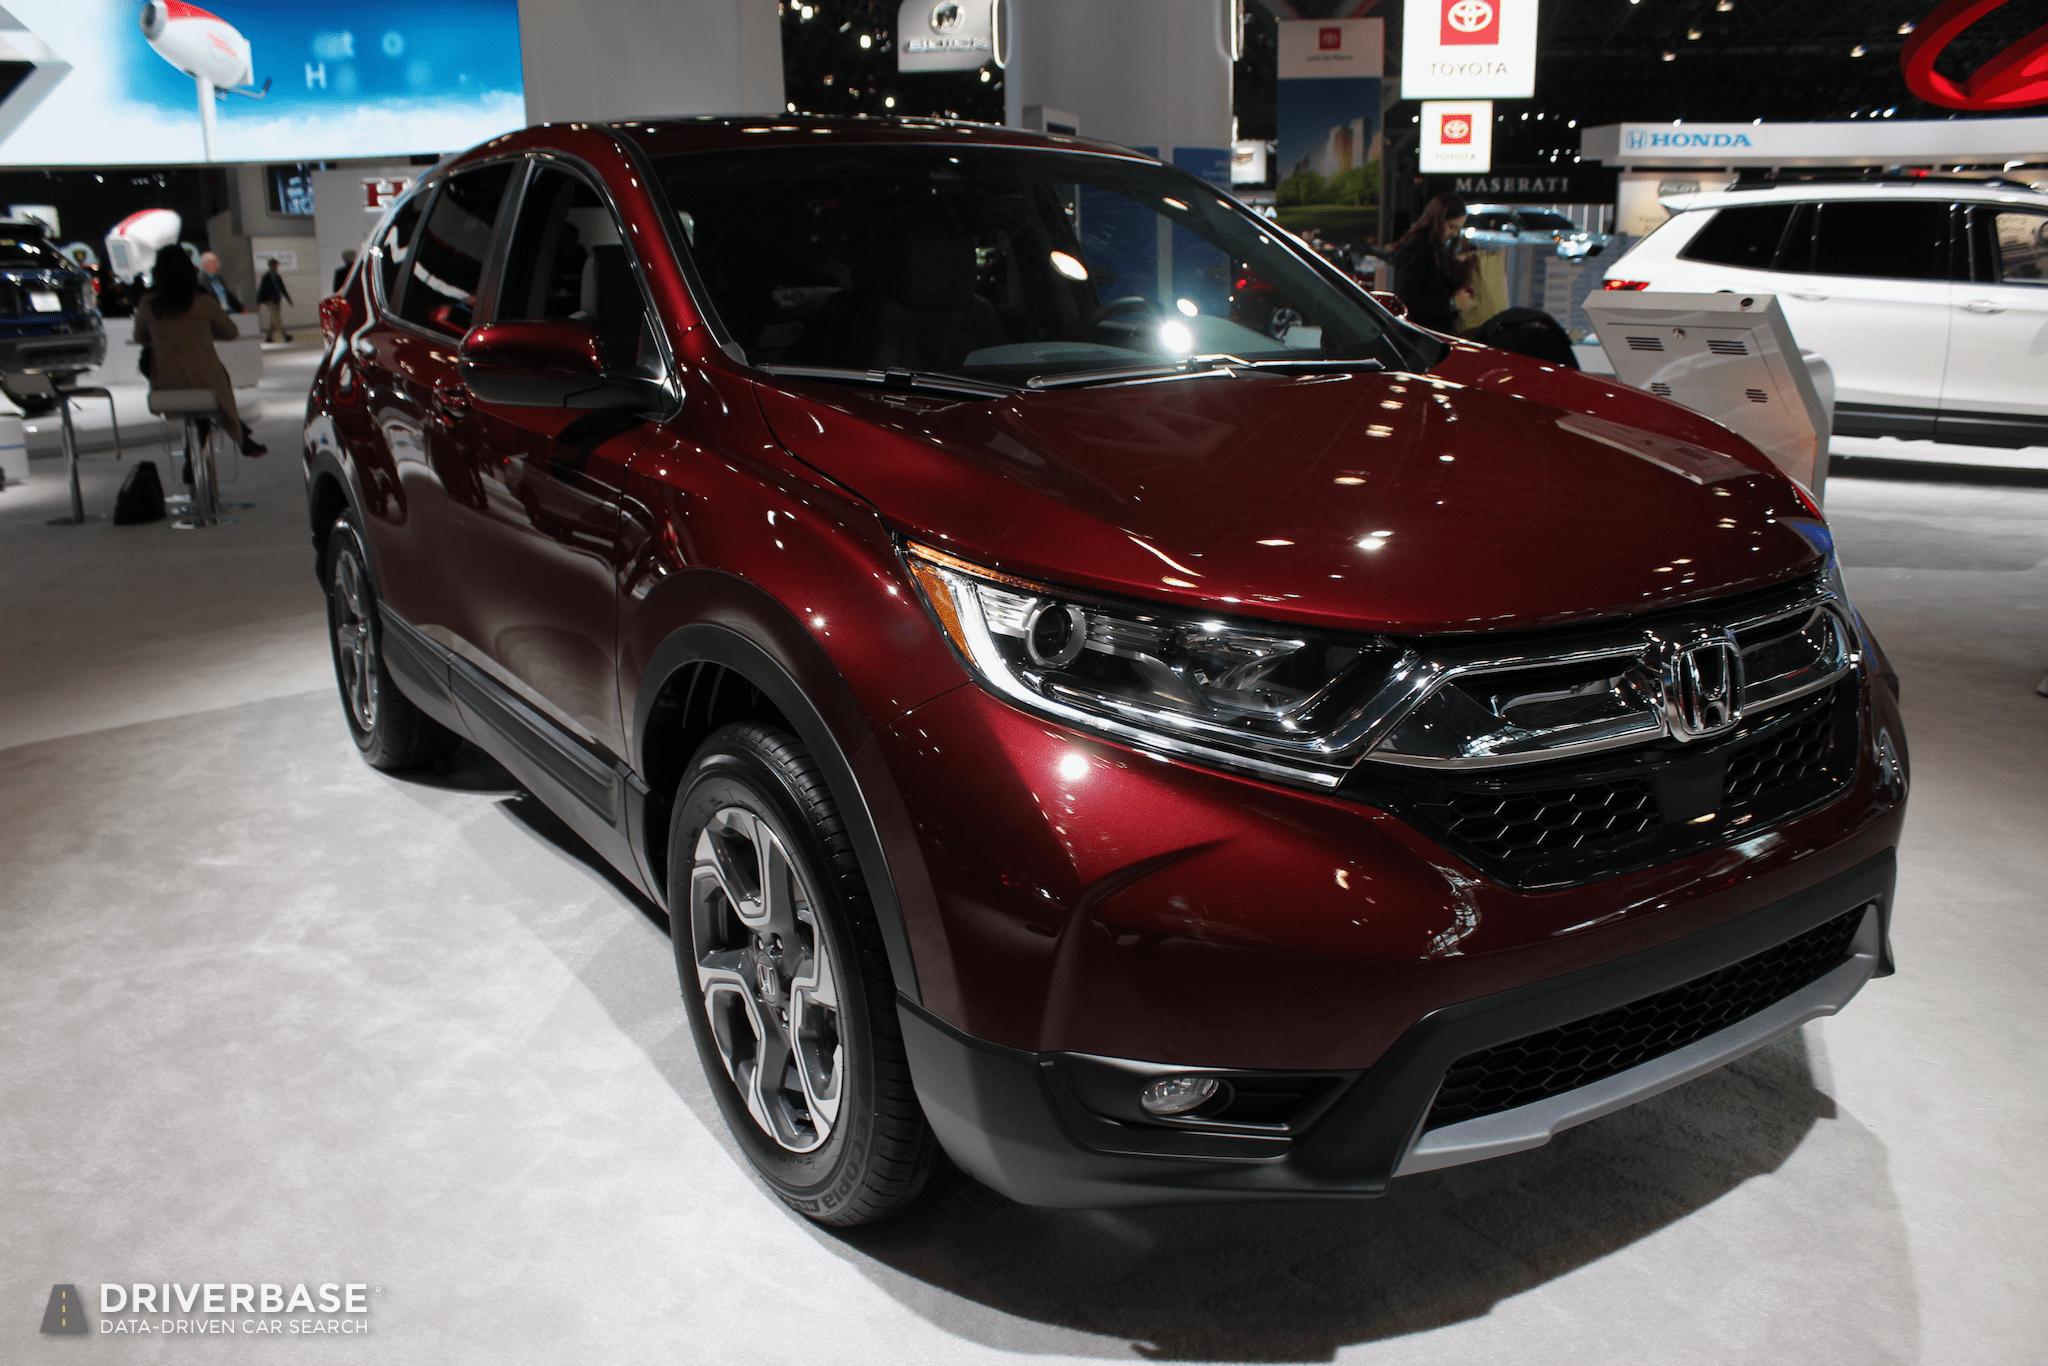 New Honda Suv >> 2020 Honda Crv Suv At The 2019 New York Auto Show Driverbase